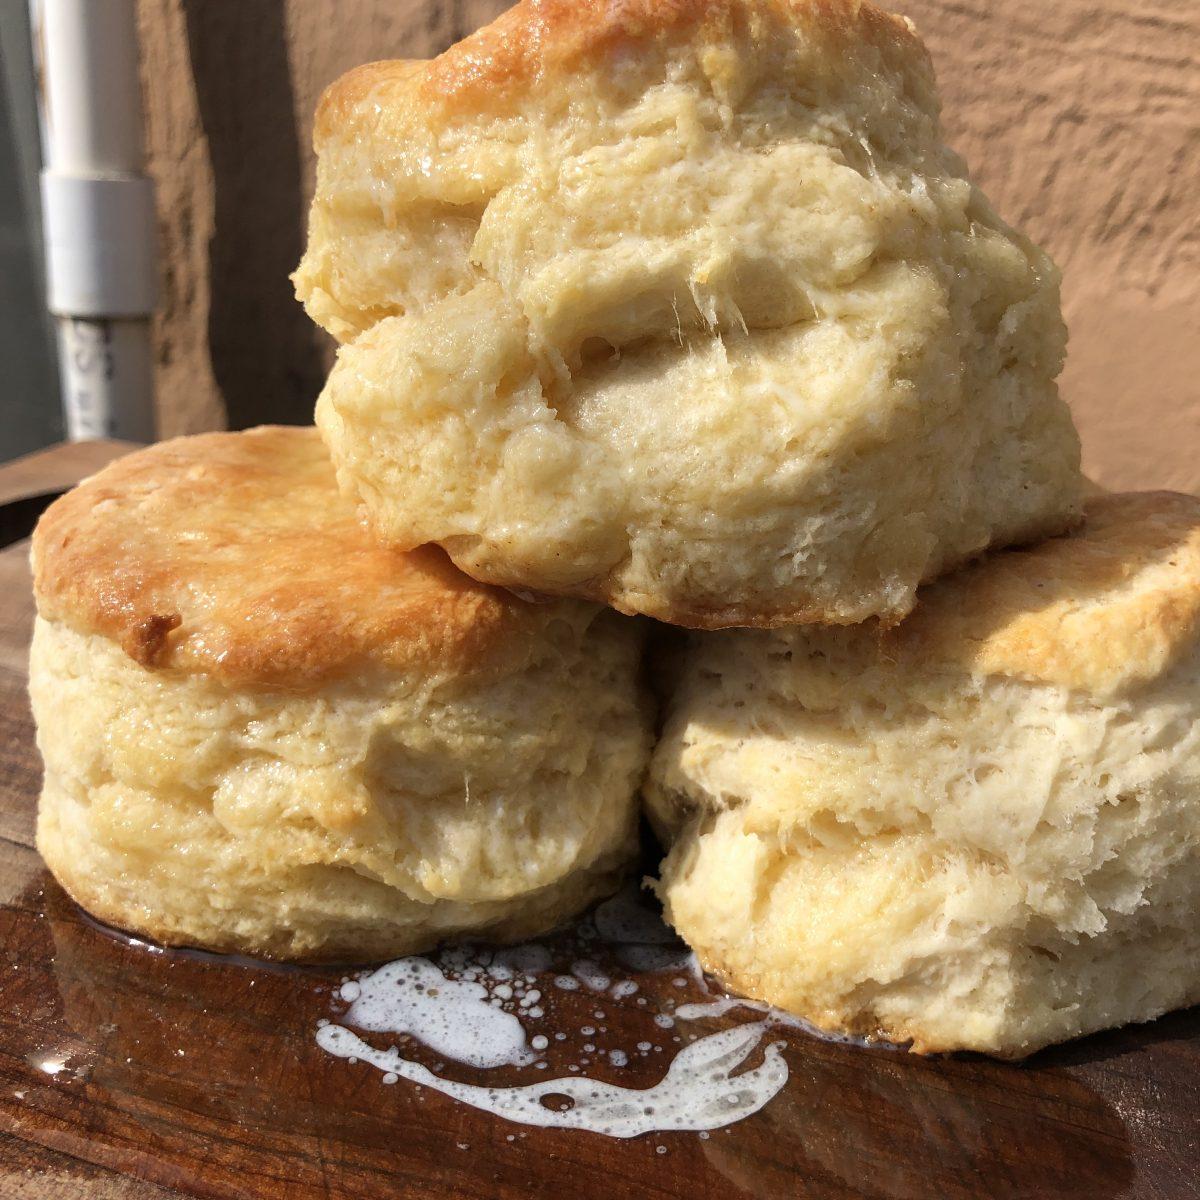 Buttermilk biscuits by Jumoke Jackson